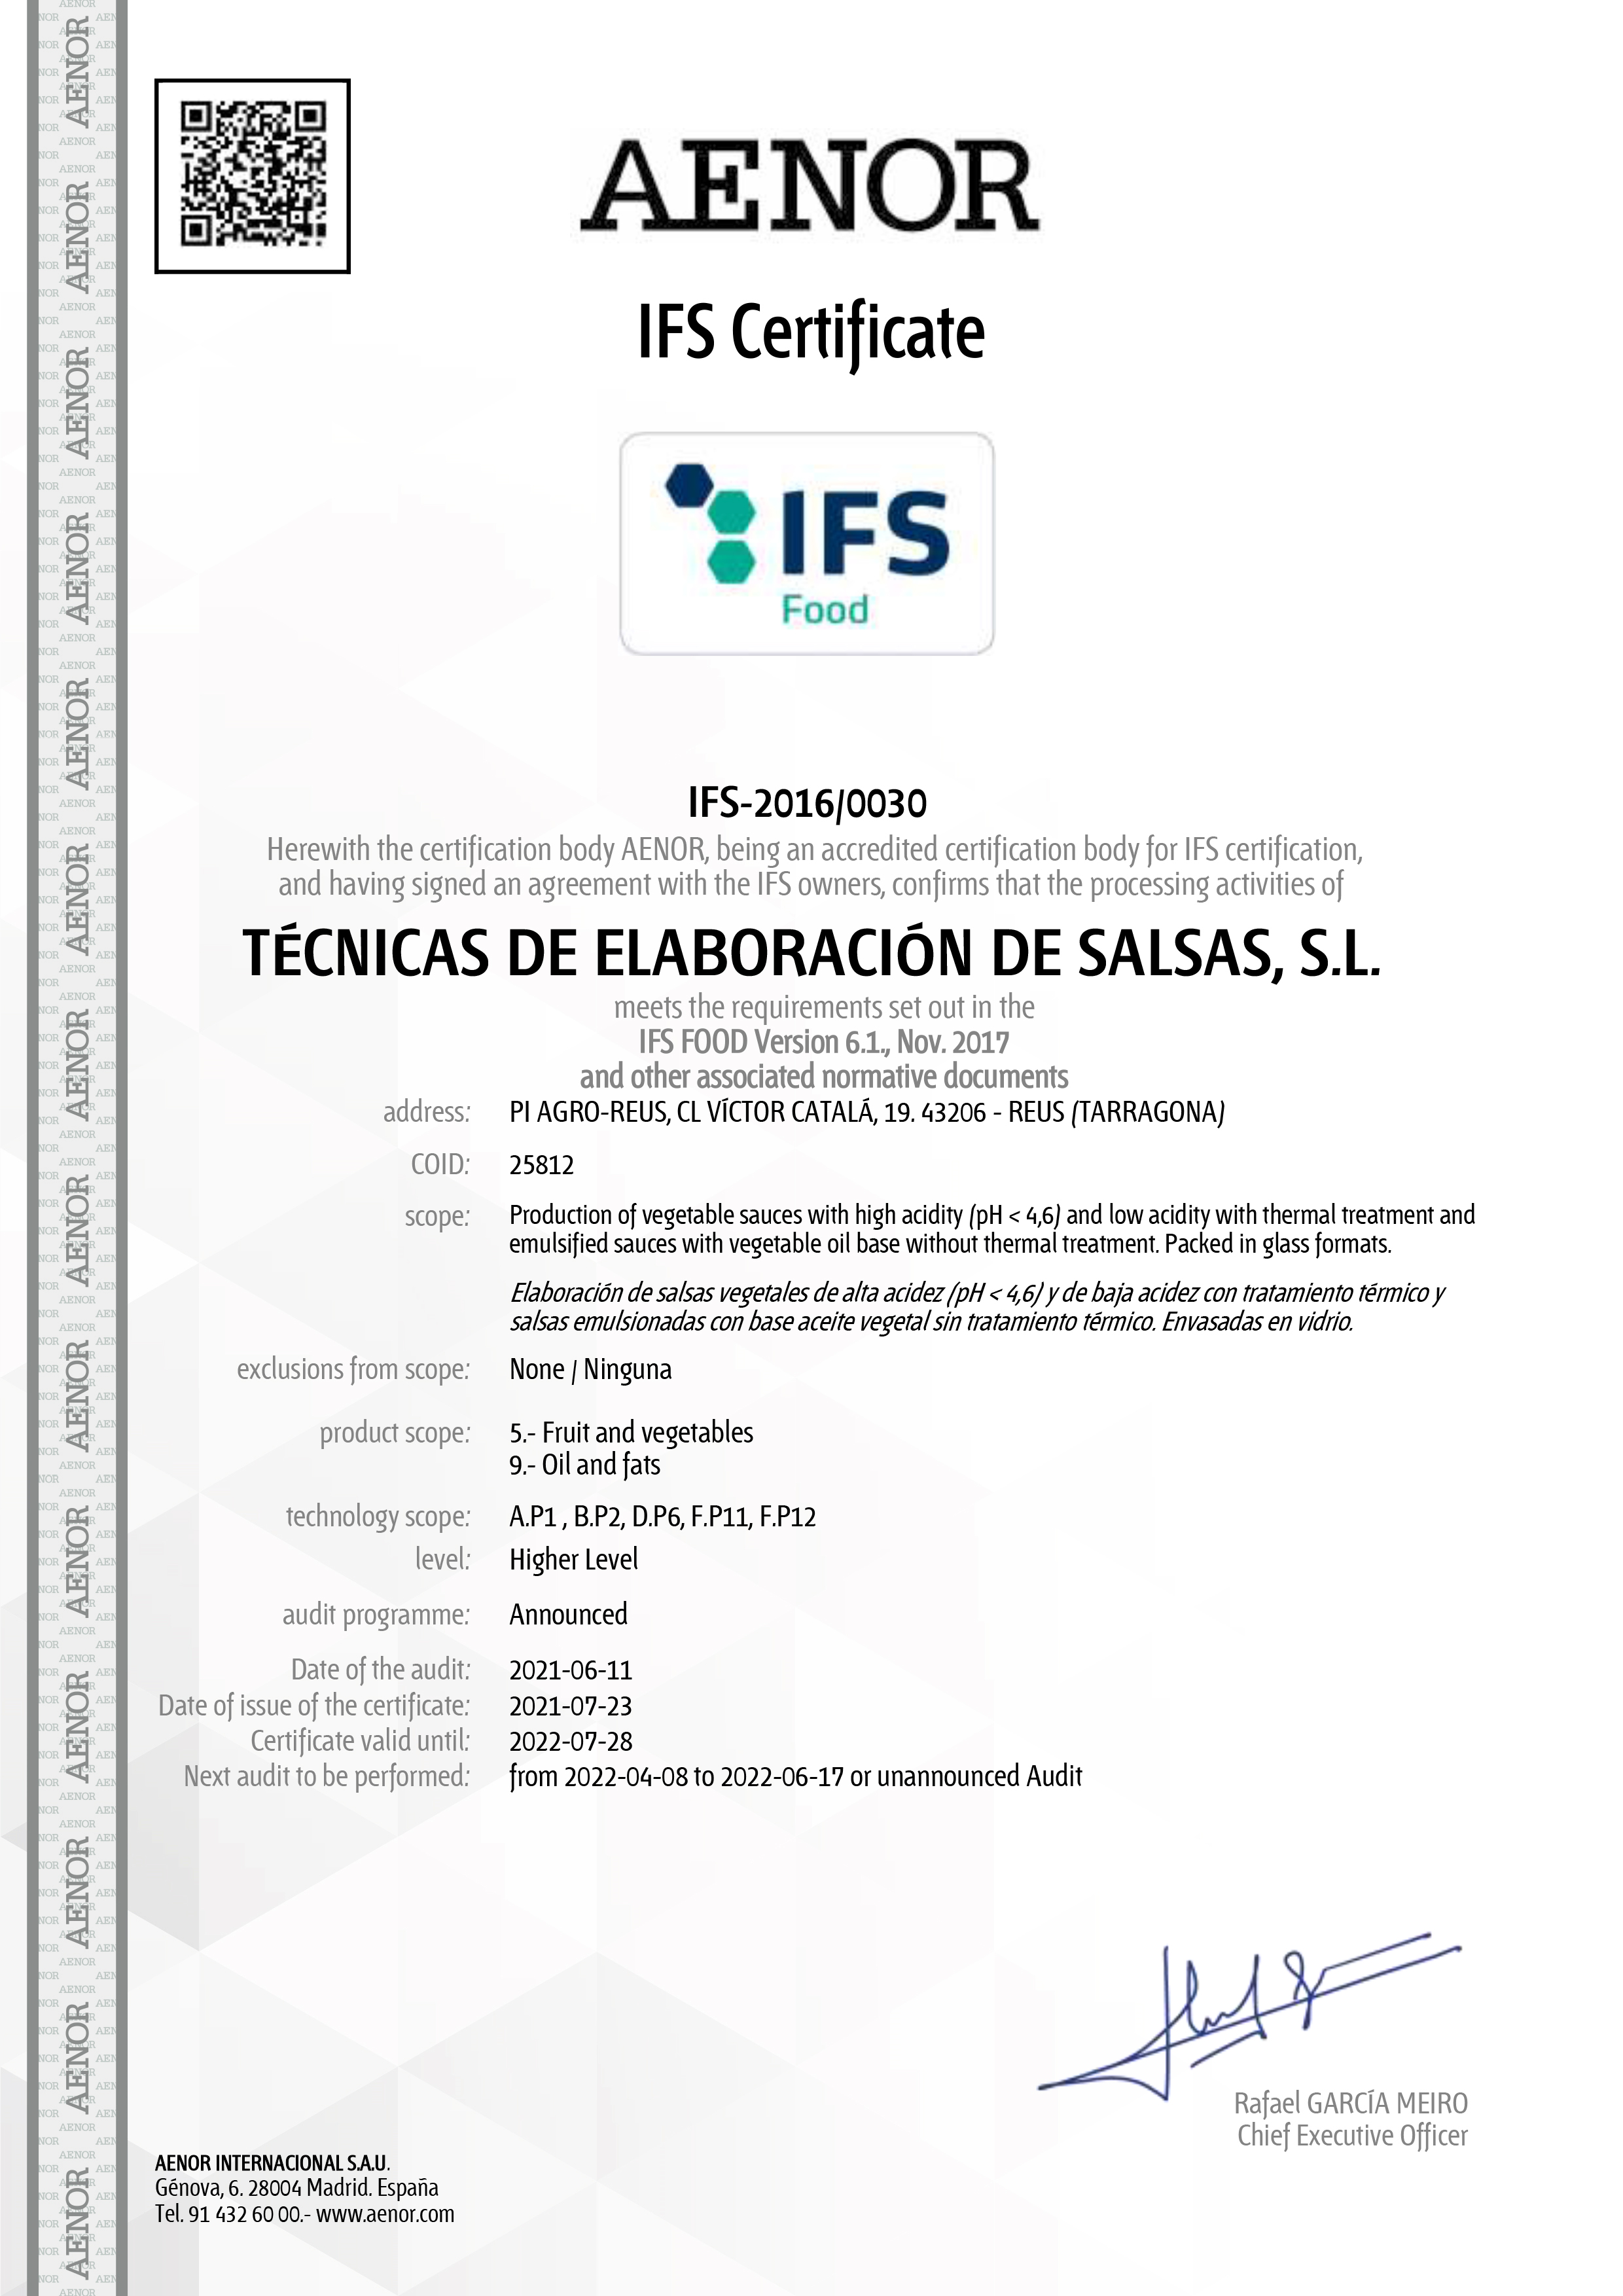 Certificado IFS – 2021 – 2022